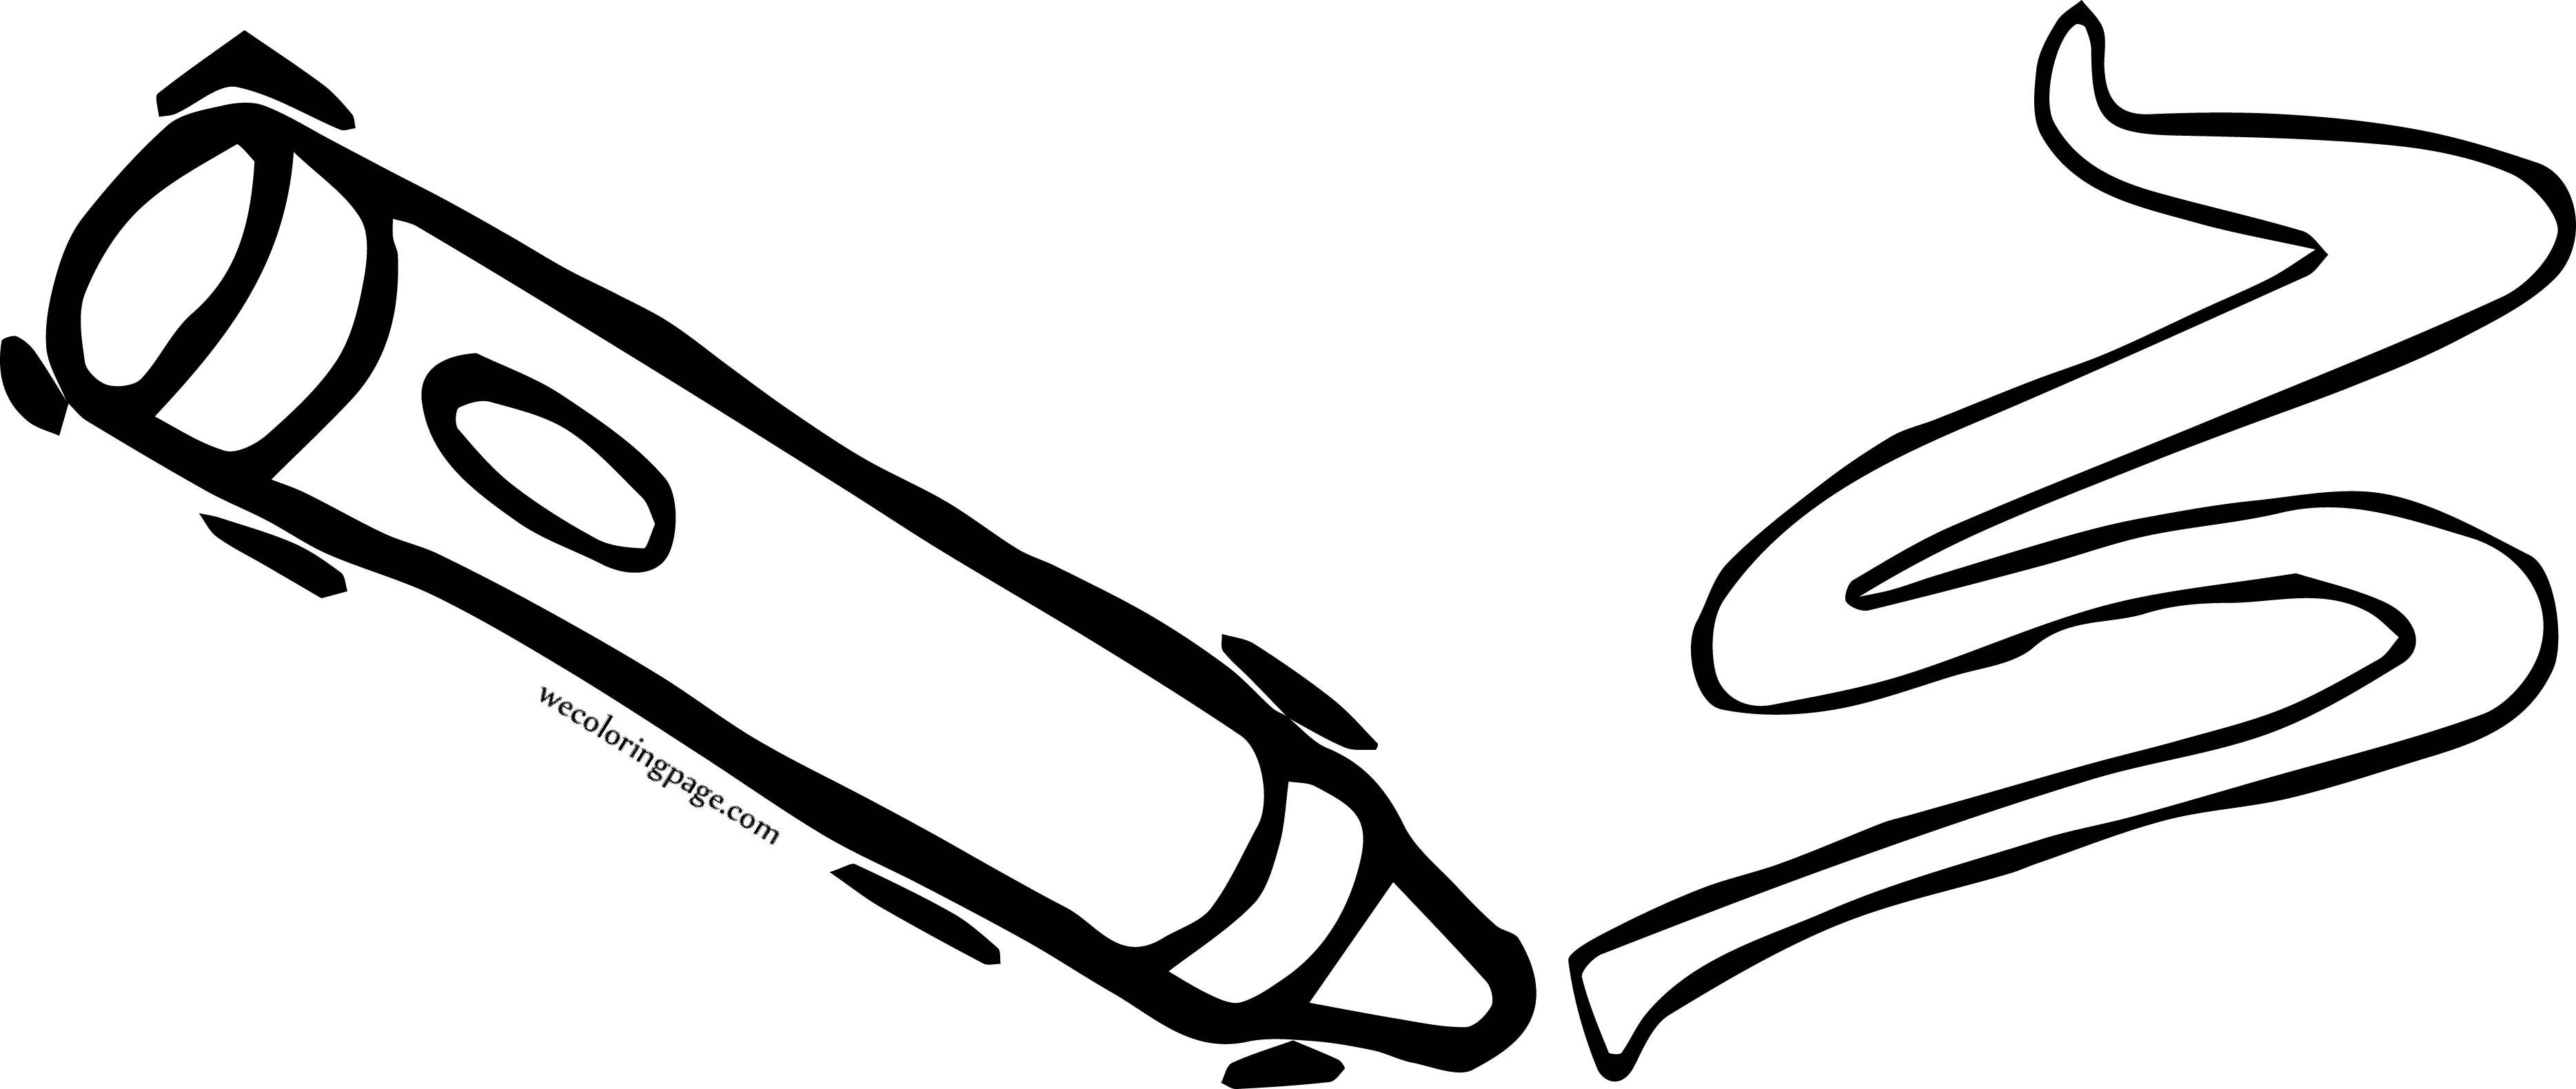 Crayon Pen Write Coloring Page